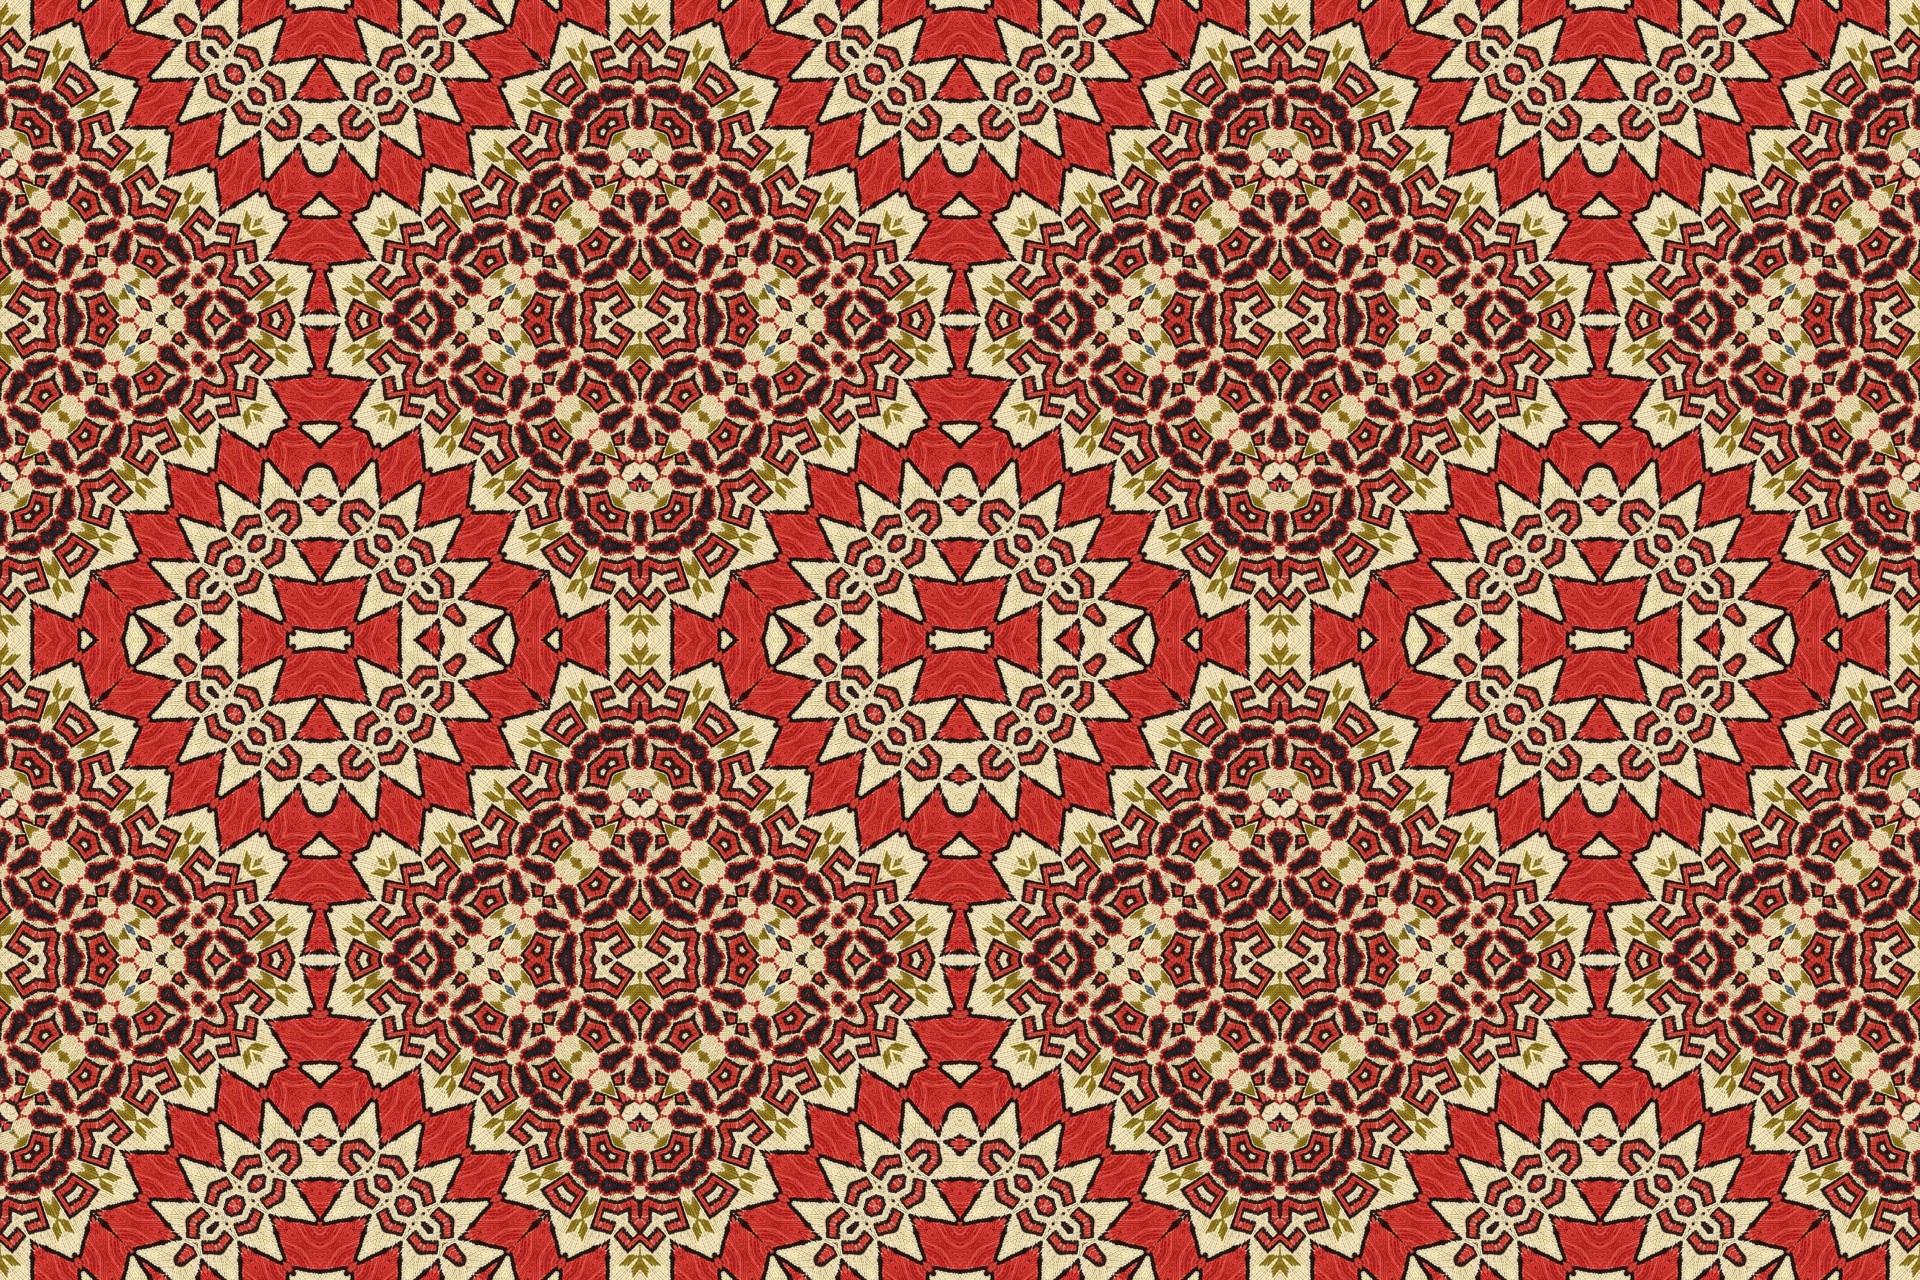 carpet patterns free download QNMYLBM